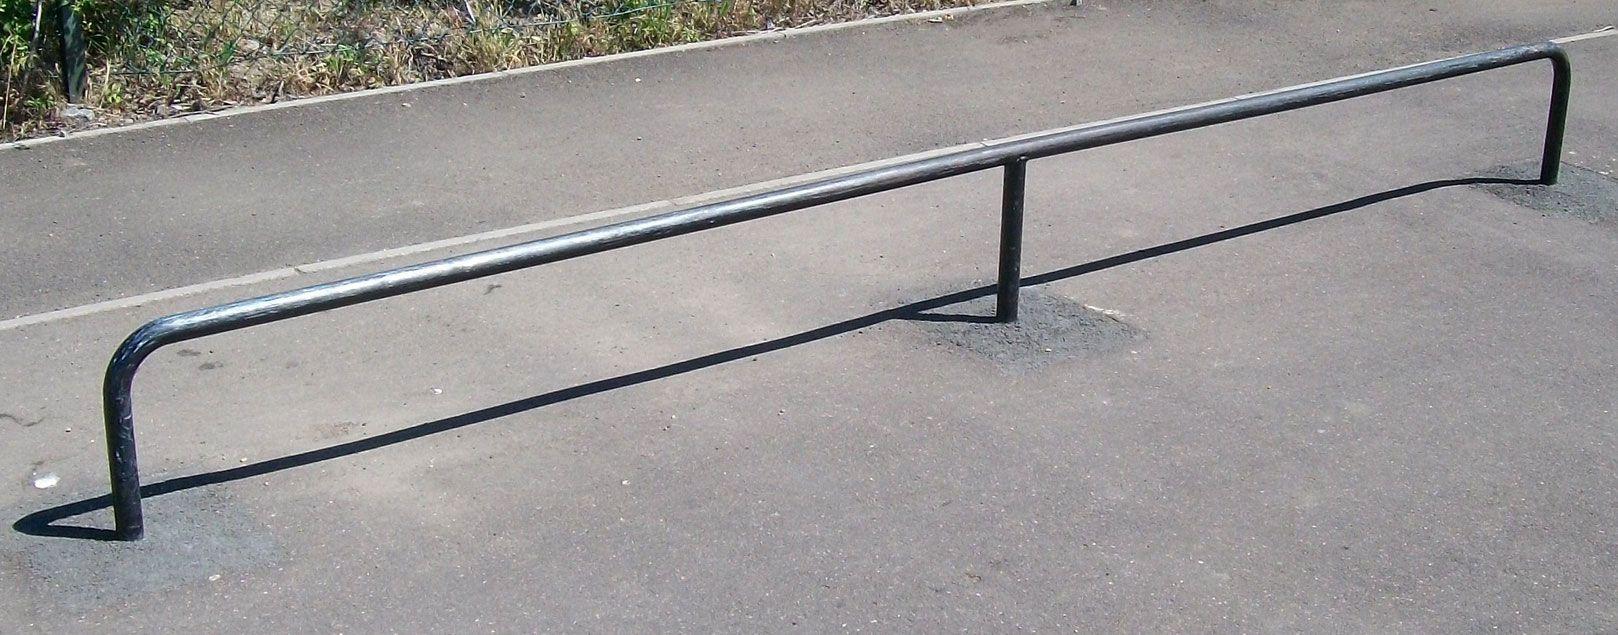 straight grind rail 2xl jpg 1618 635 cuthill park pinterest